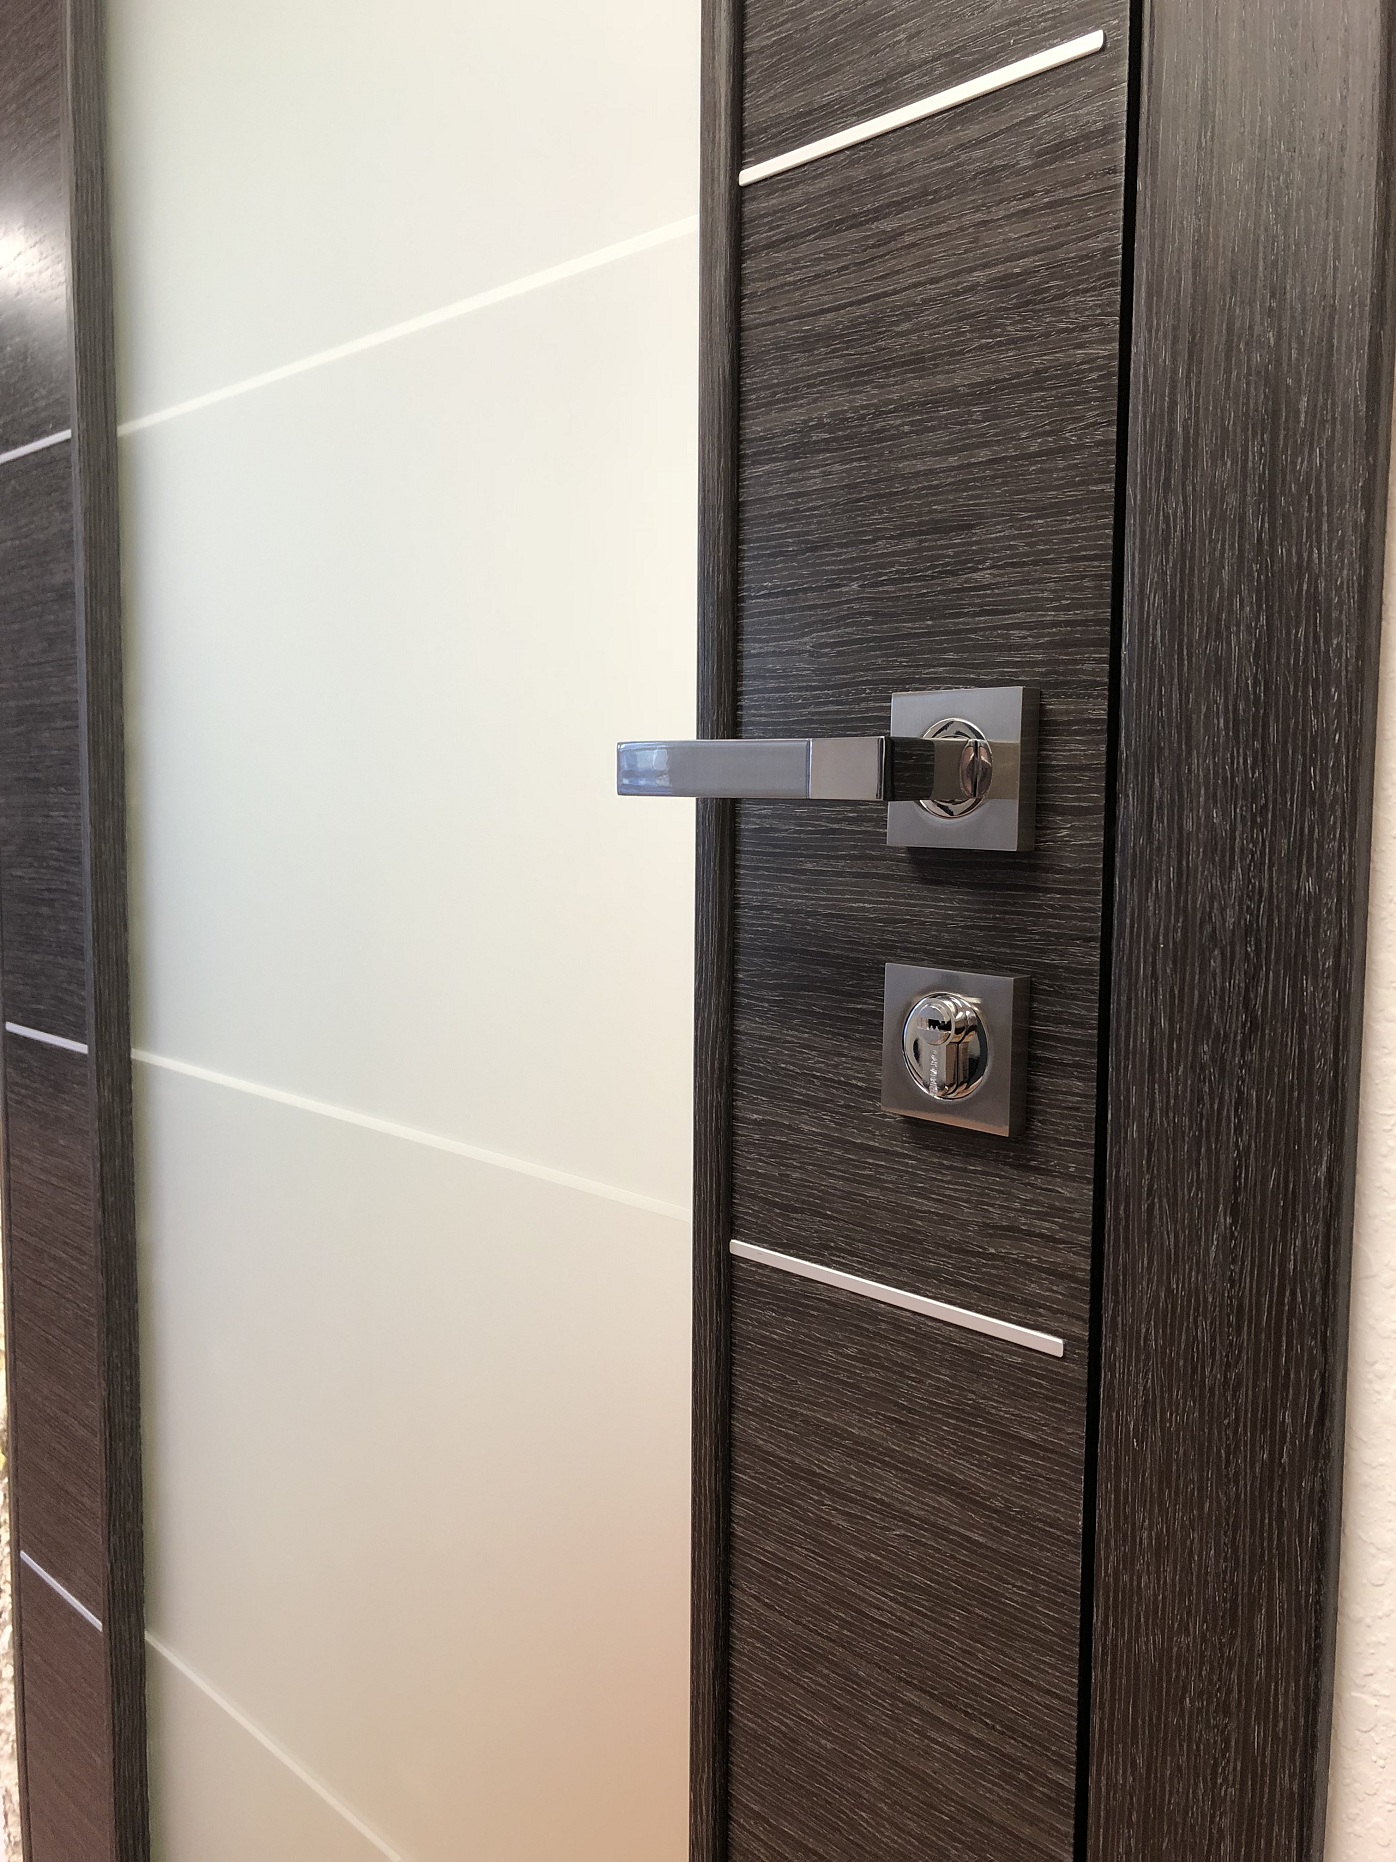 Image Versa Vetro Interior Door Black Apricot 1